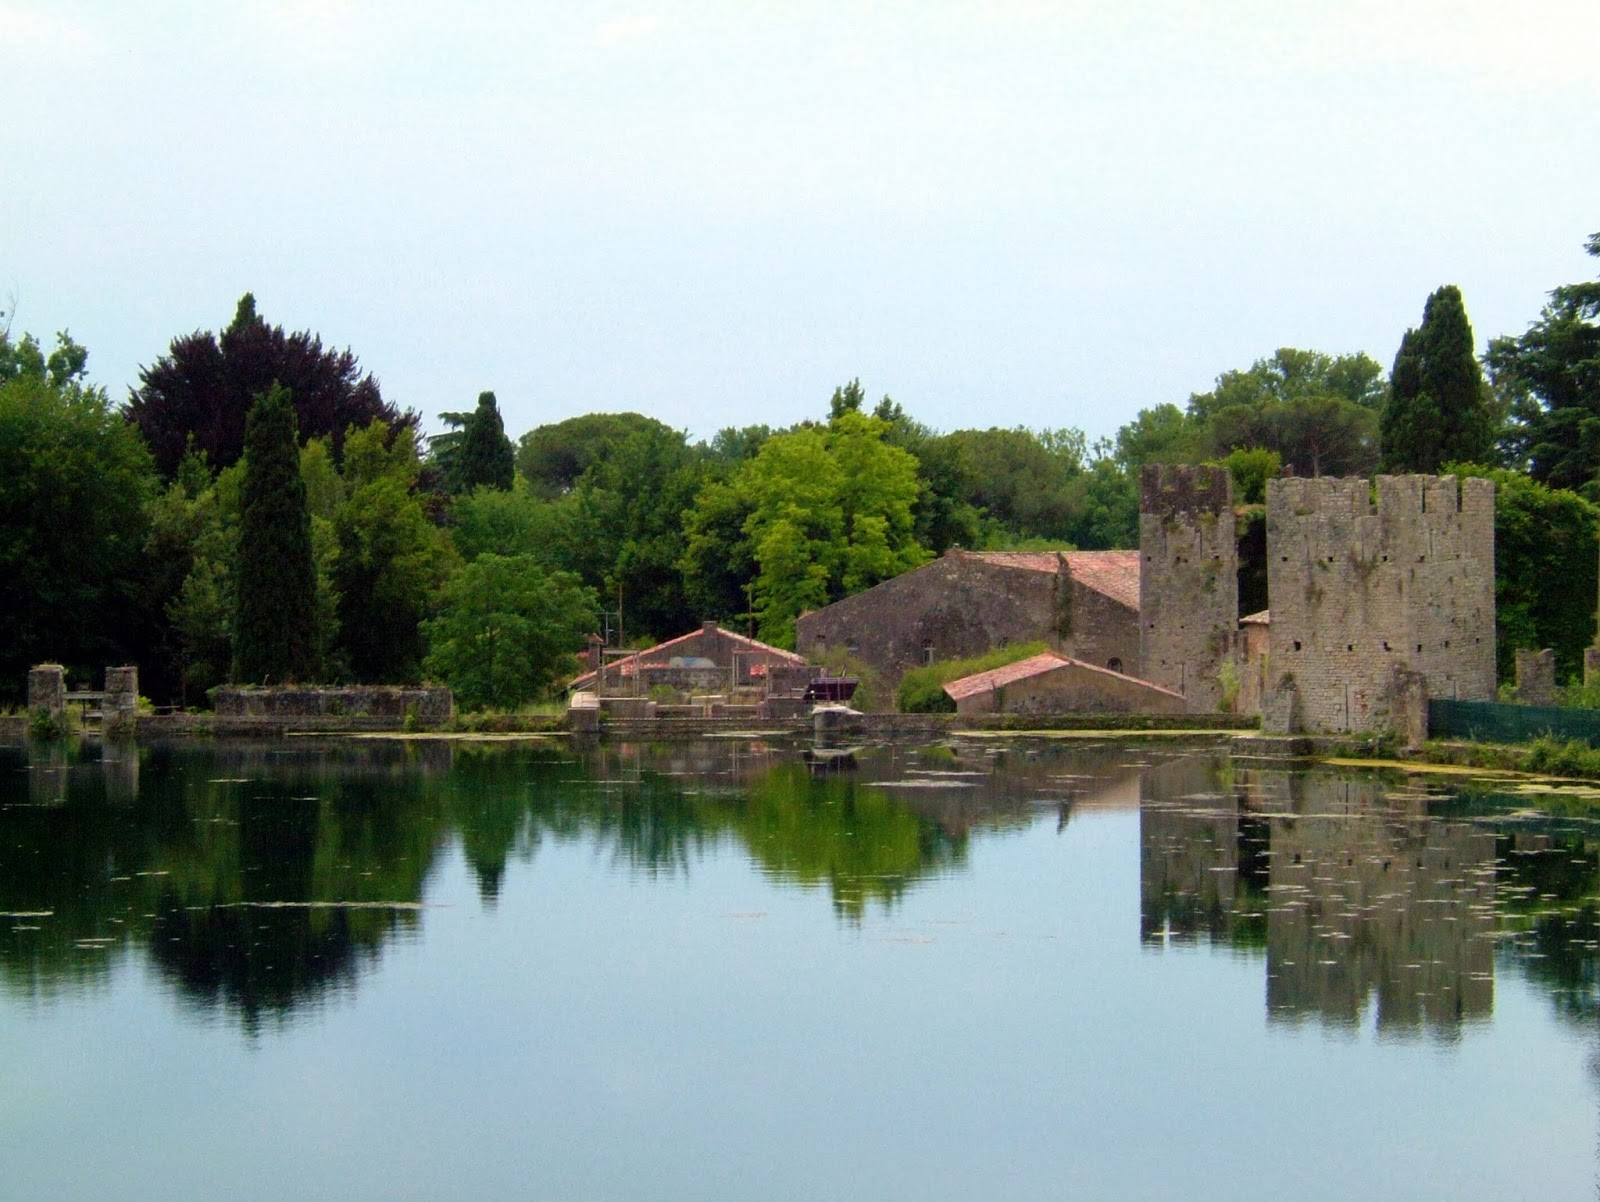 AMarutti1 - O Jardim de Ninfa